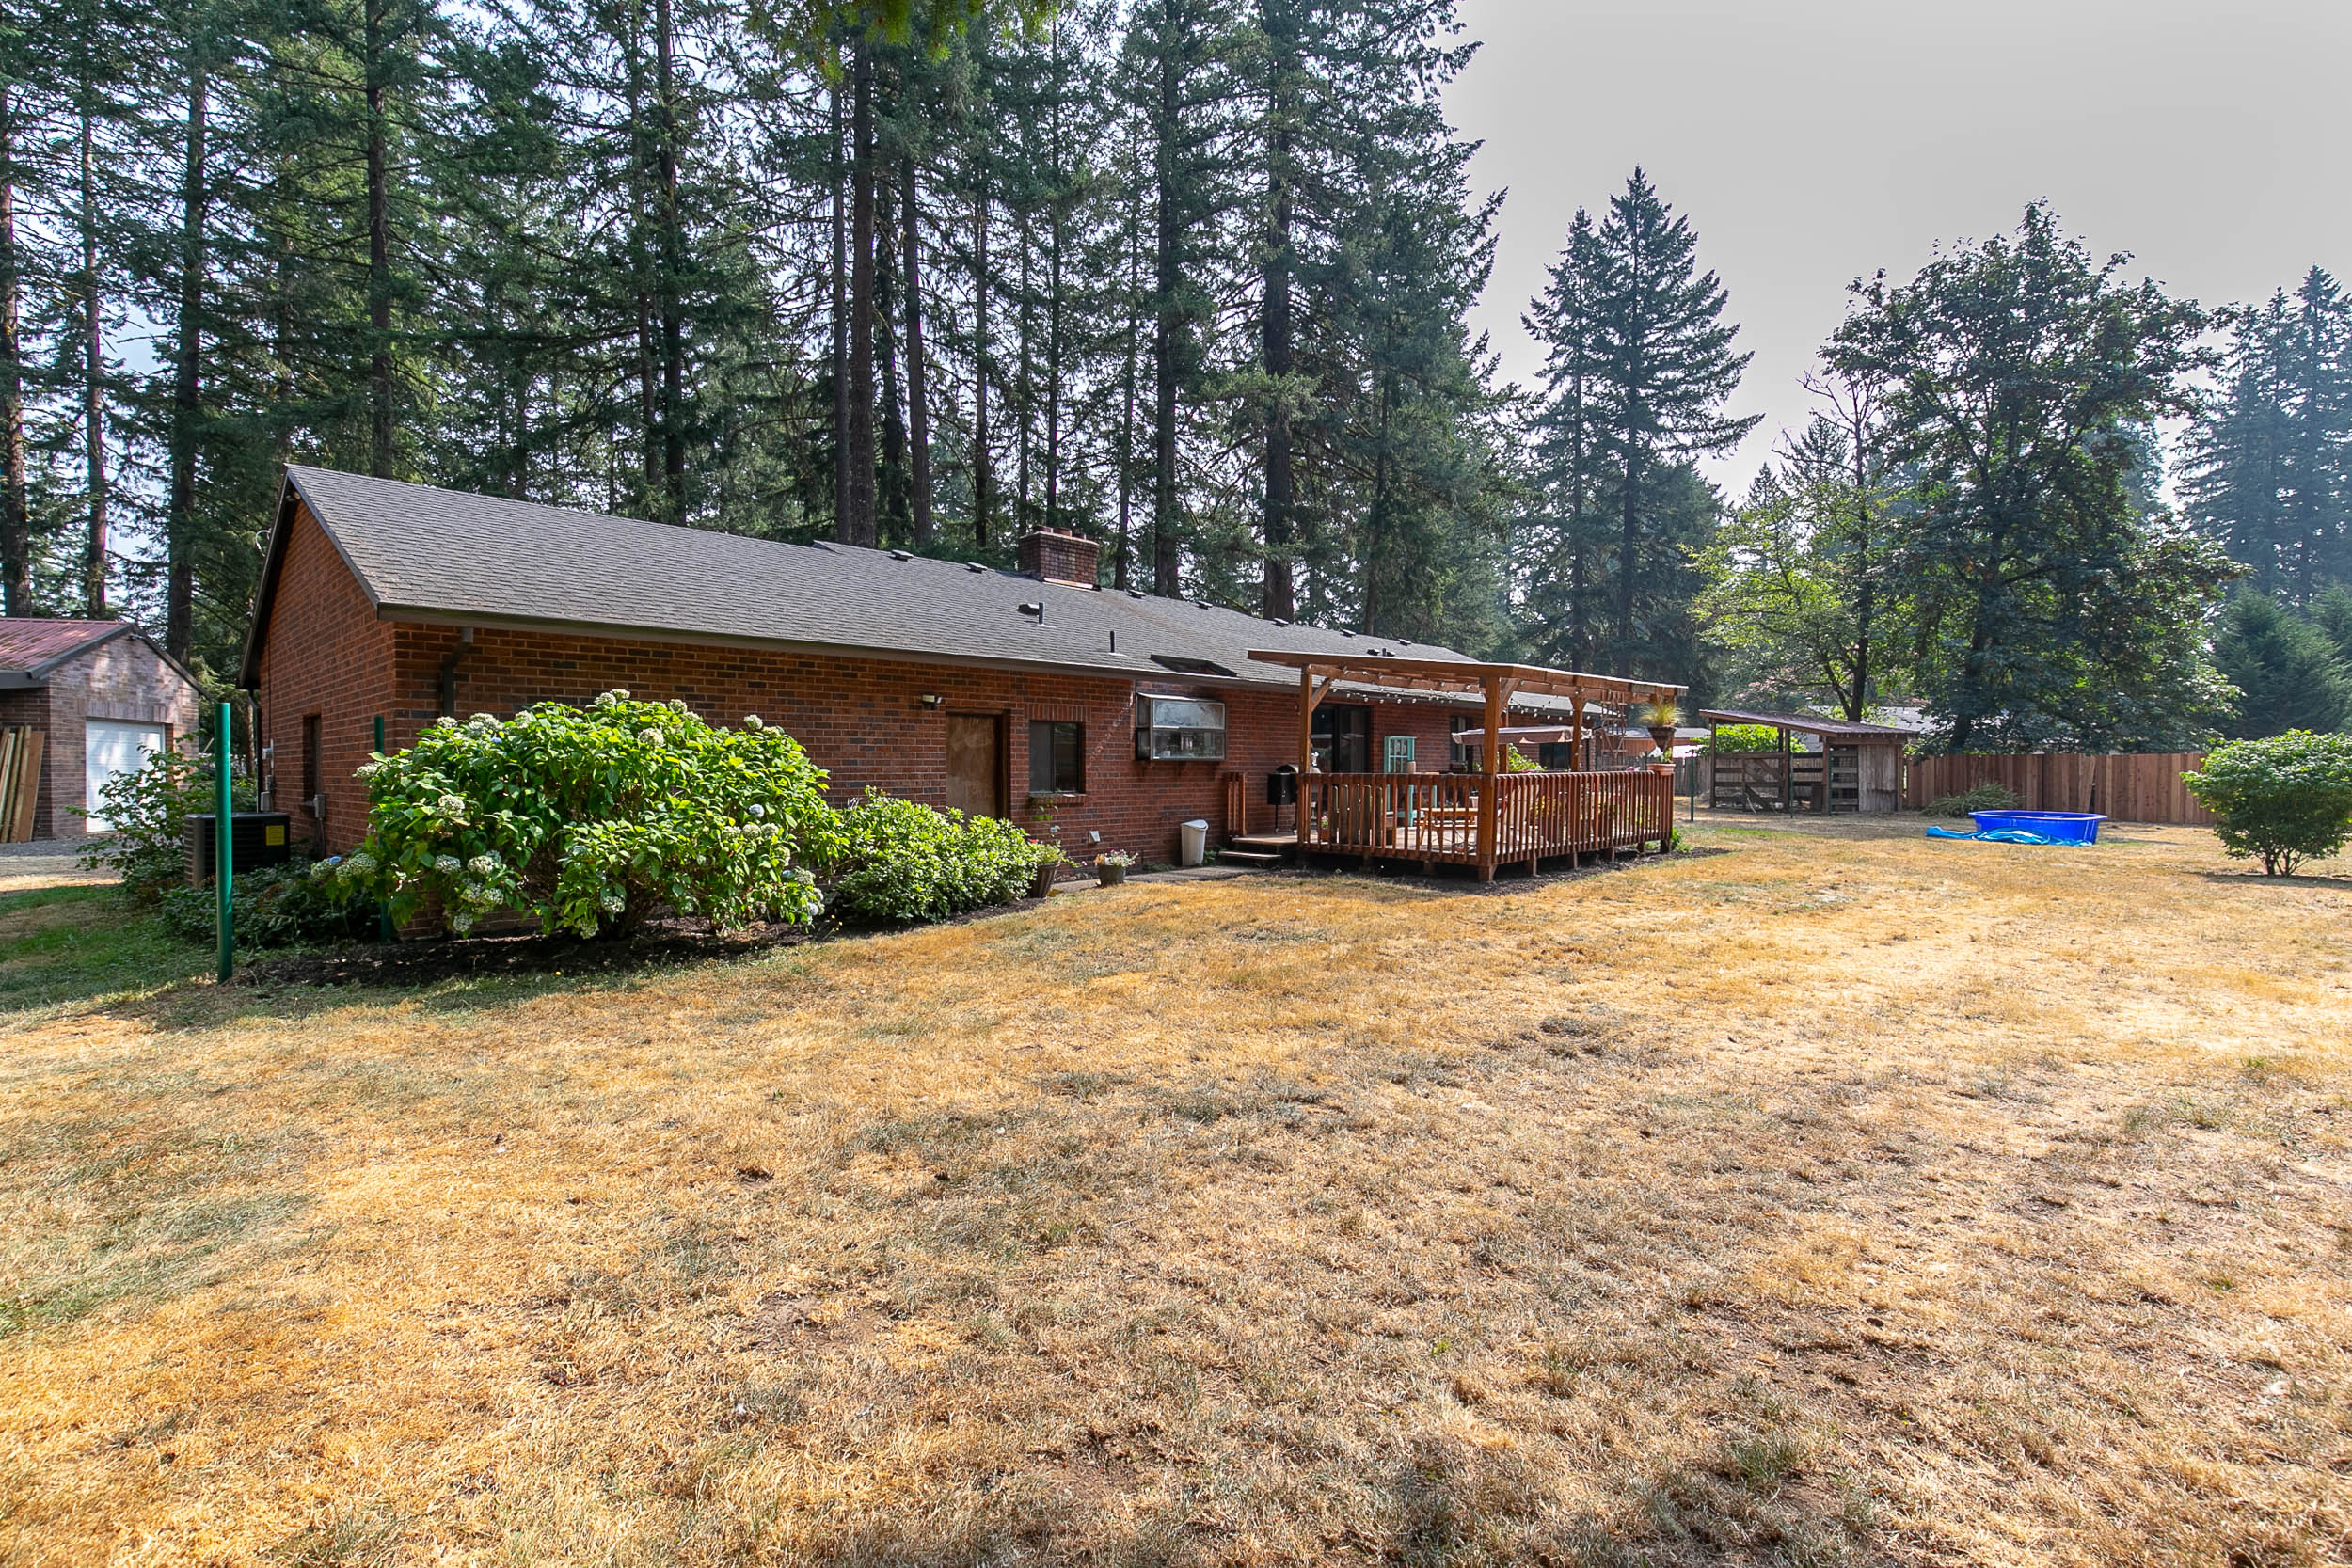 043_16181 S Eaden Rd Oregon City_MG_6865-HDR.jpg